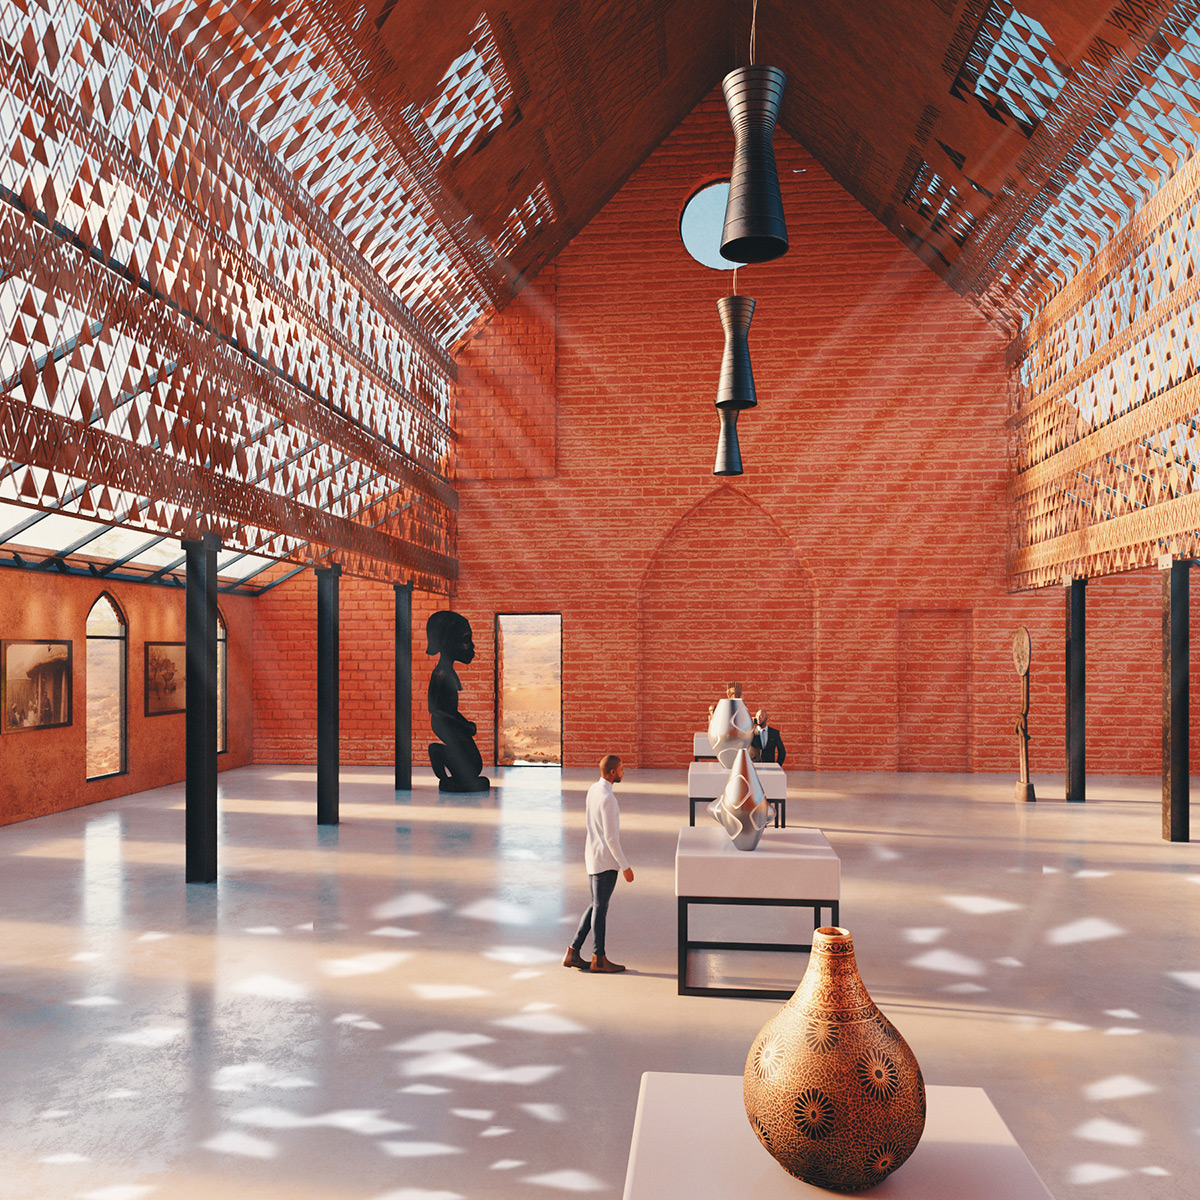 old-palapye-museum-beullah-serema-3